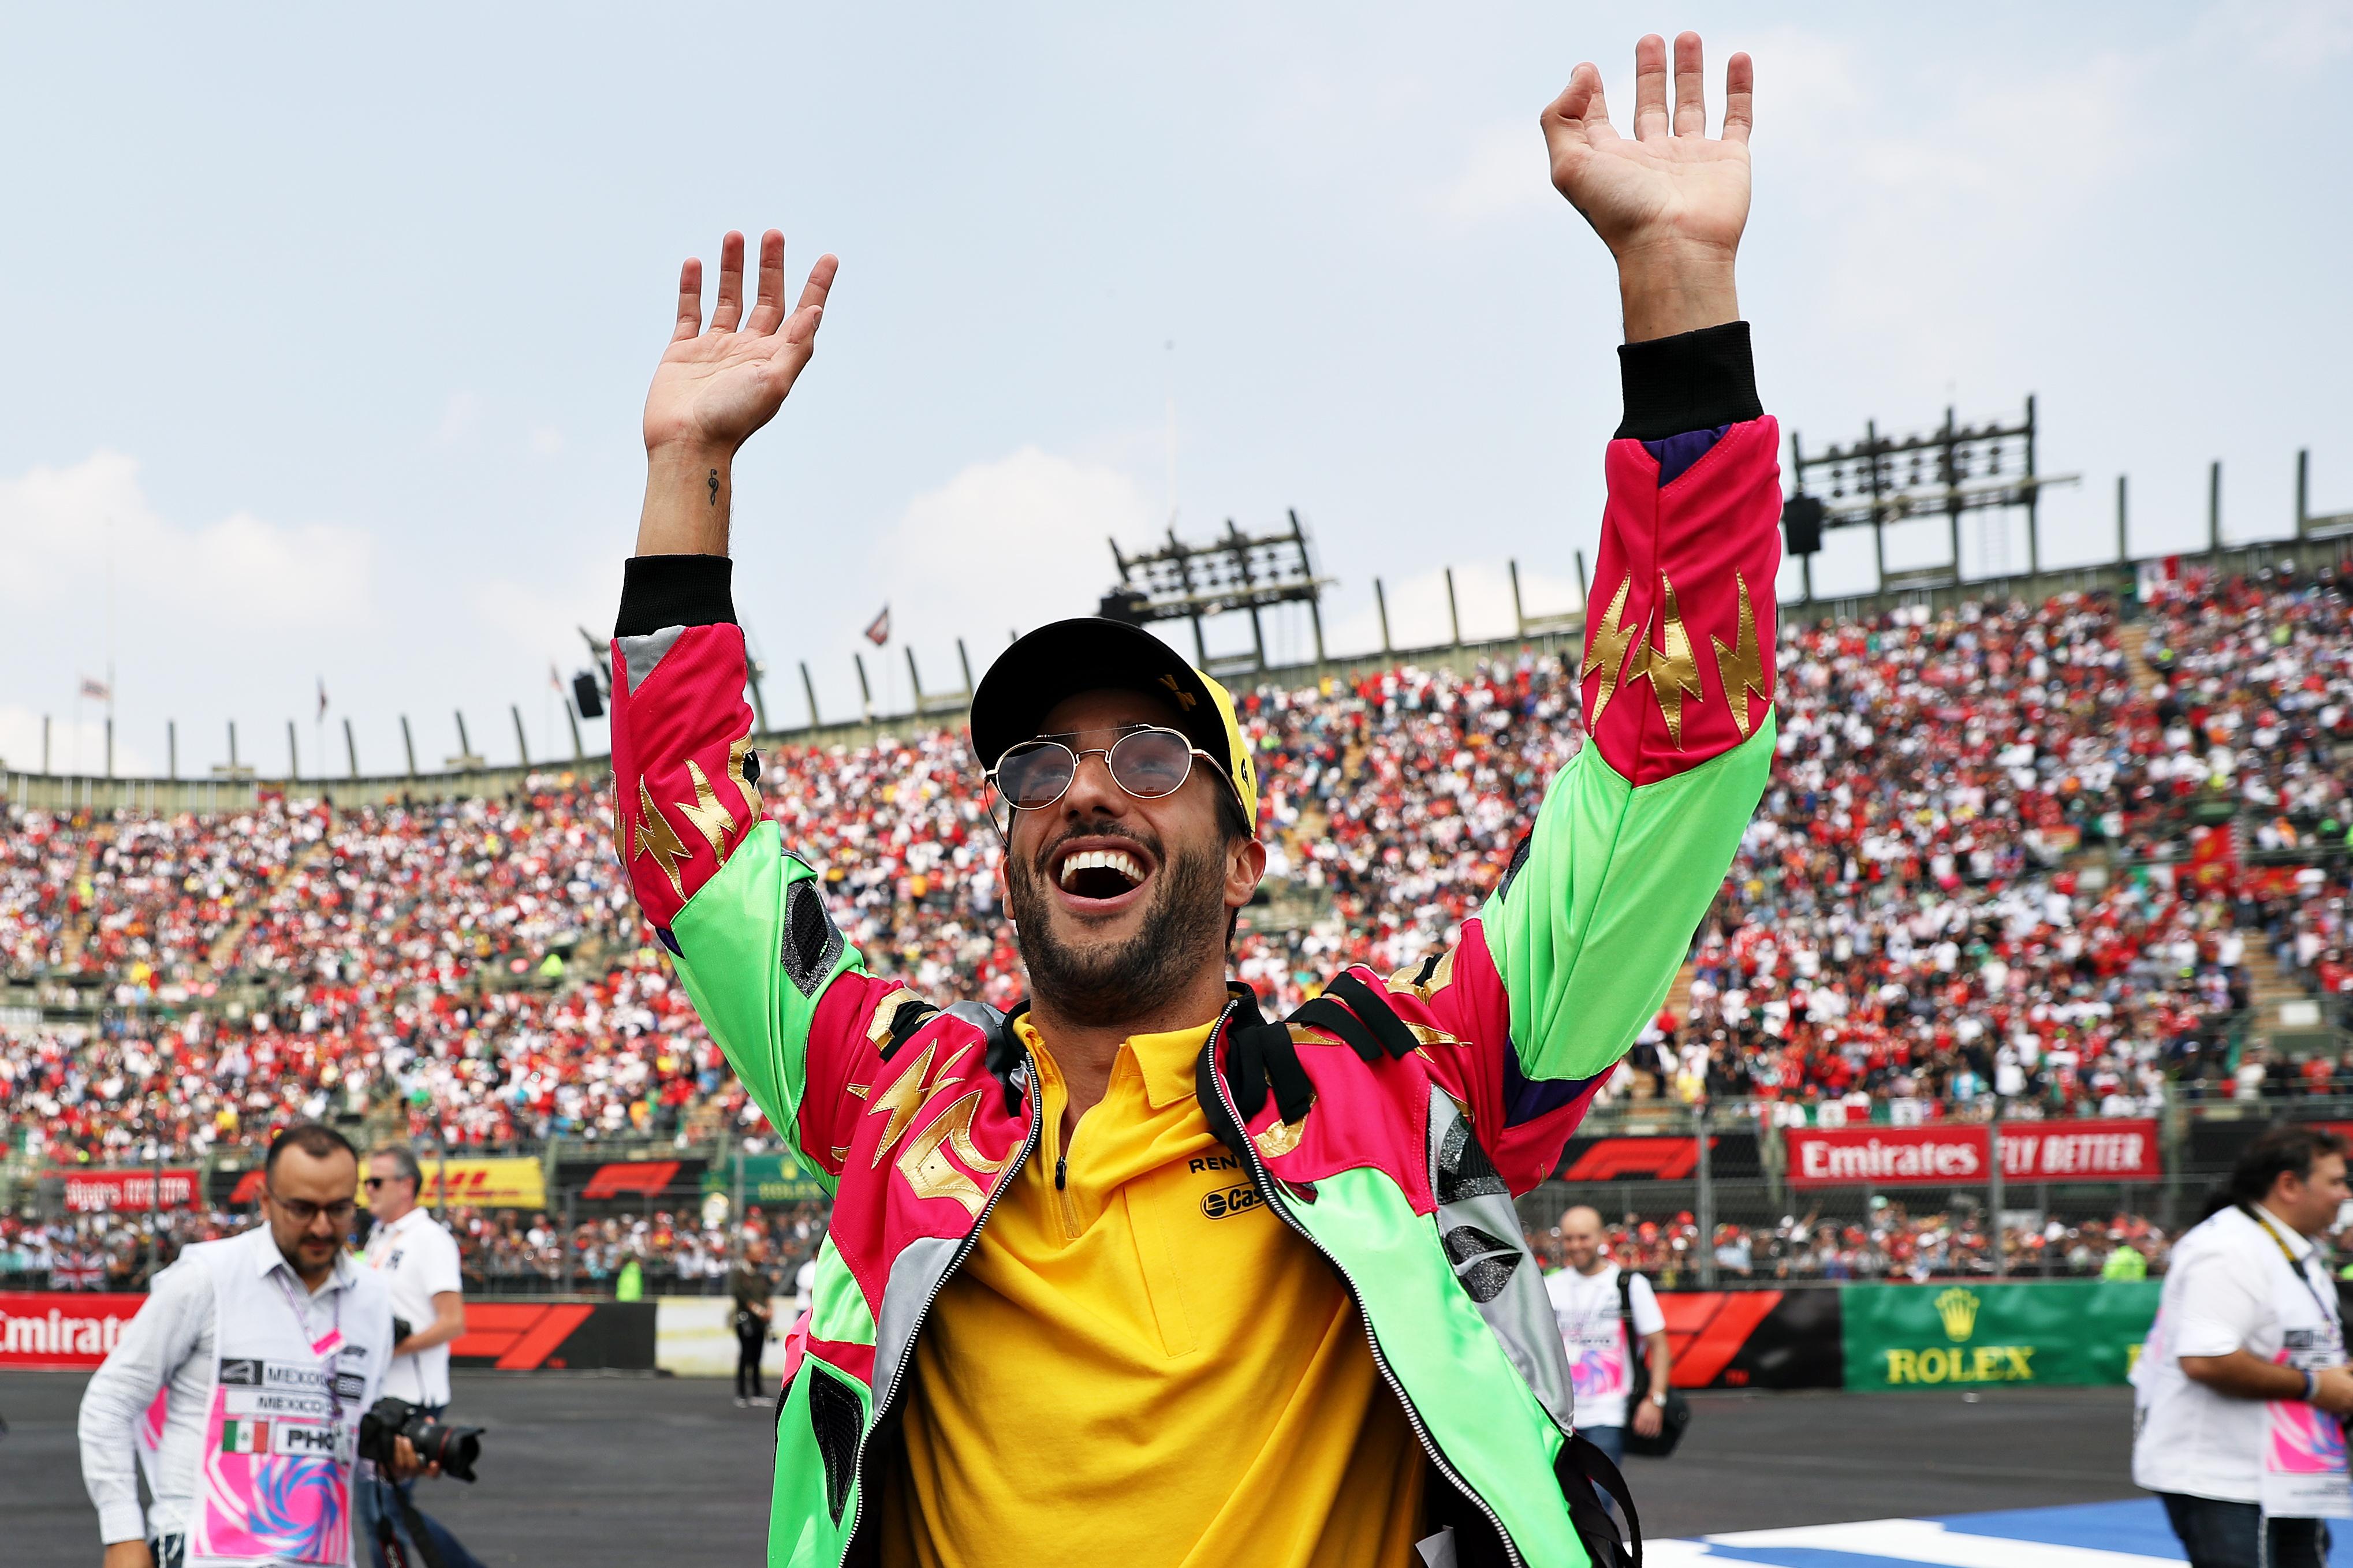 Daniel Ricciardo of Renault Sport F1 waves to the Formula 1 crowd on the drivers parade